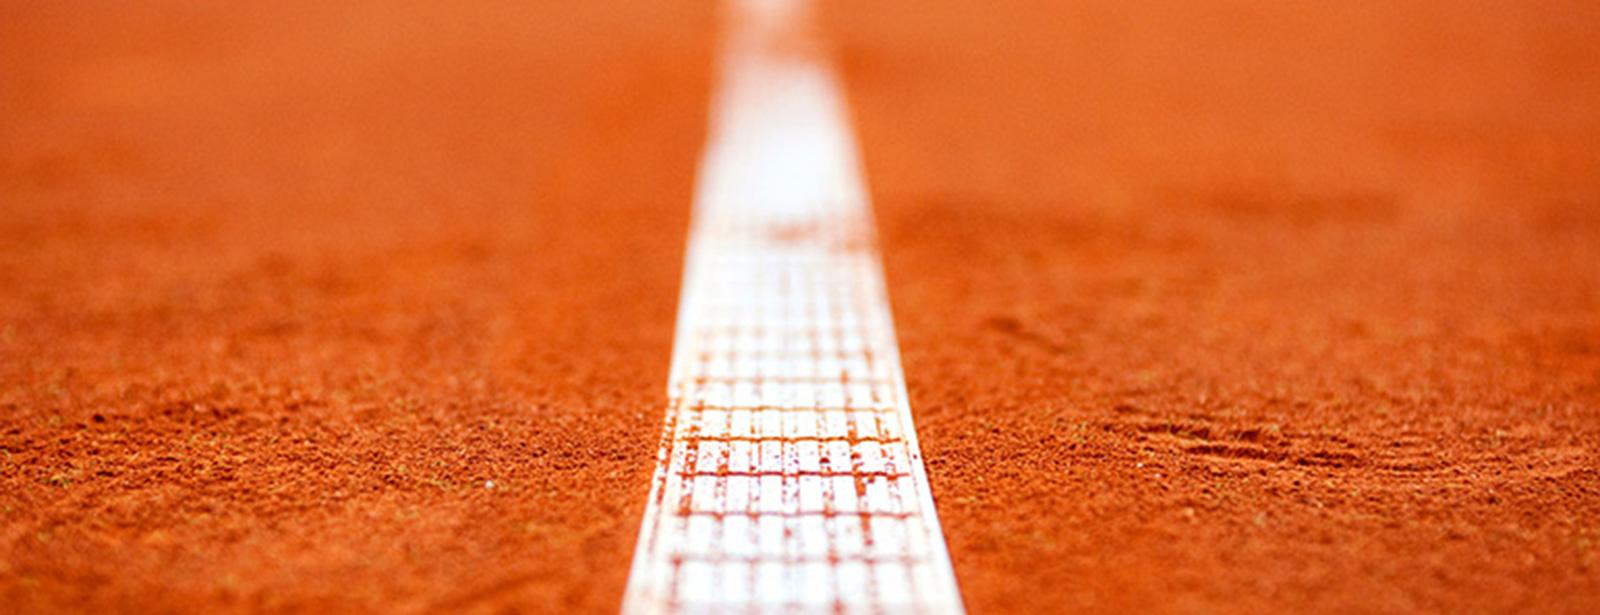 Tennis Dr Ing H C F Porsche Ag Presse Datenbank